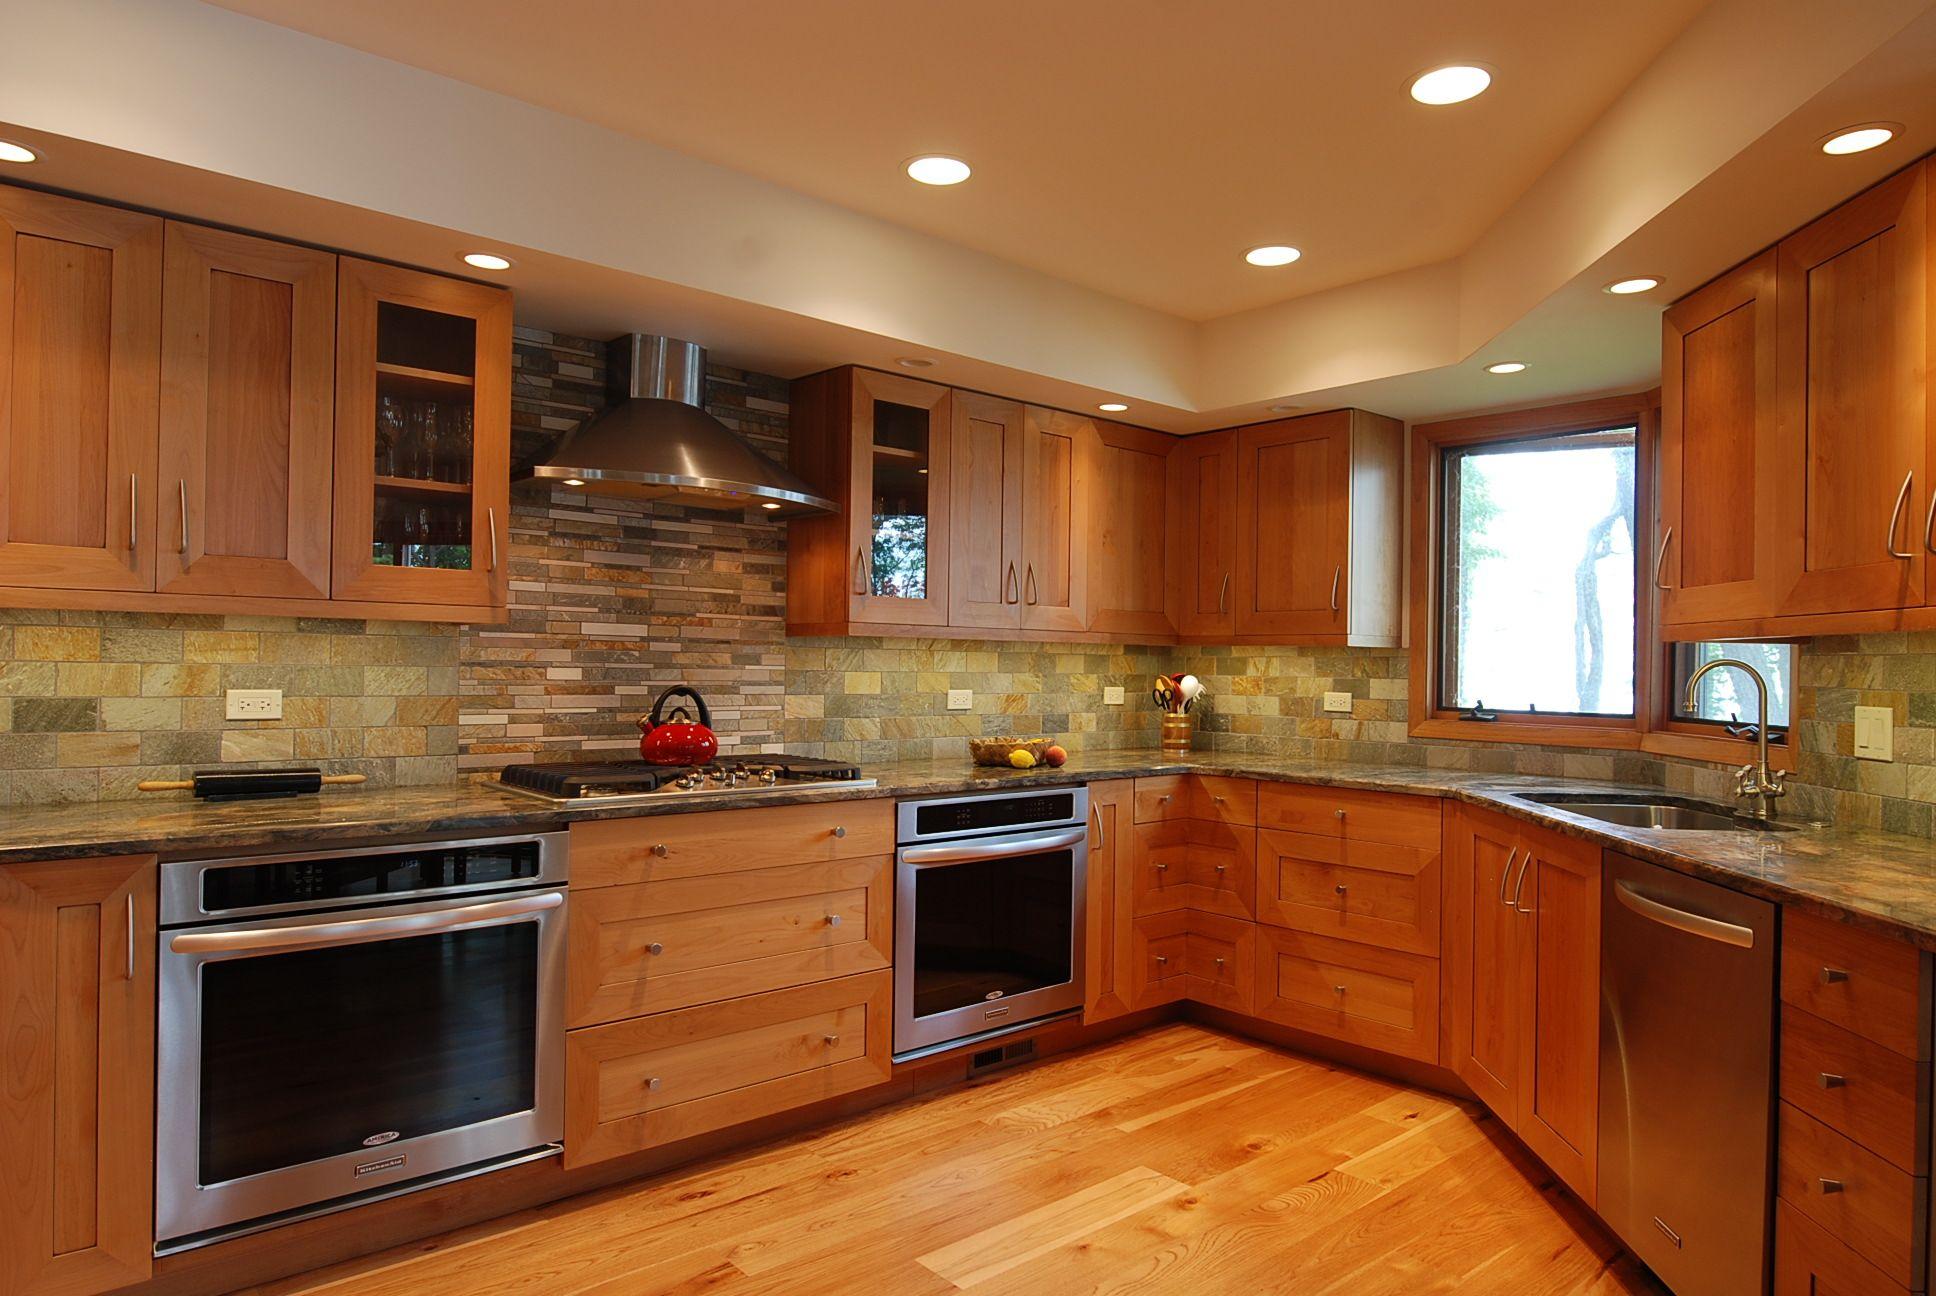 Omega Inset Cabinets In A Cerused Pecan Finish Fusion Quartzite Countertops Multi Colored Slate Backsplash Brick Floor Kitchen Kitchen Kitchen Plans